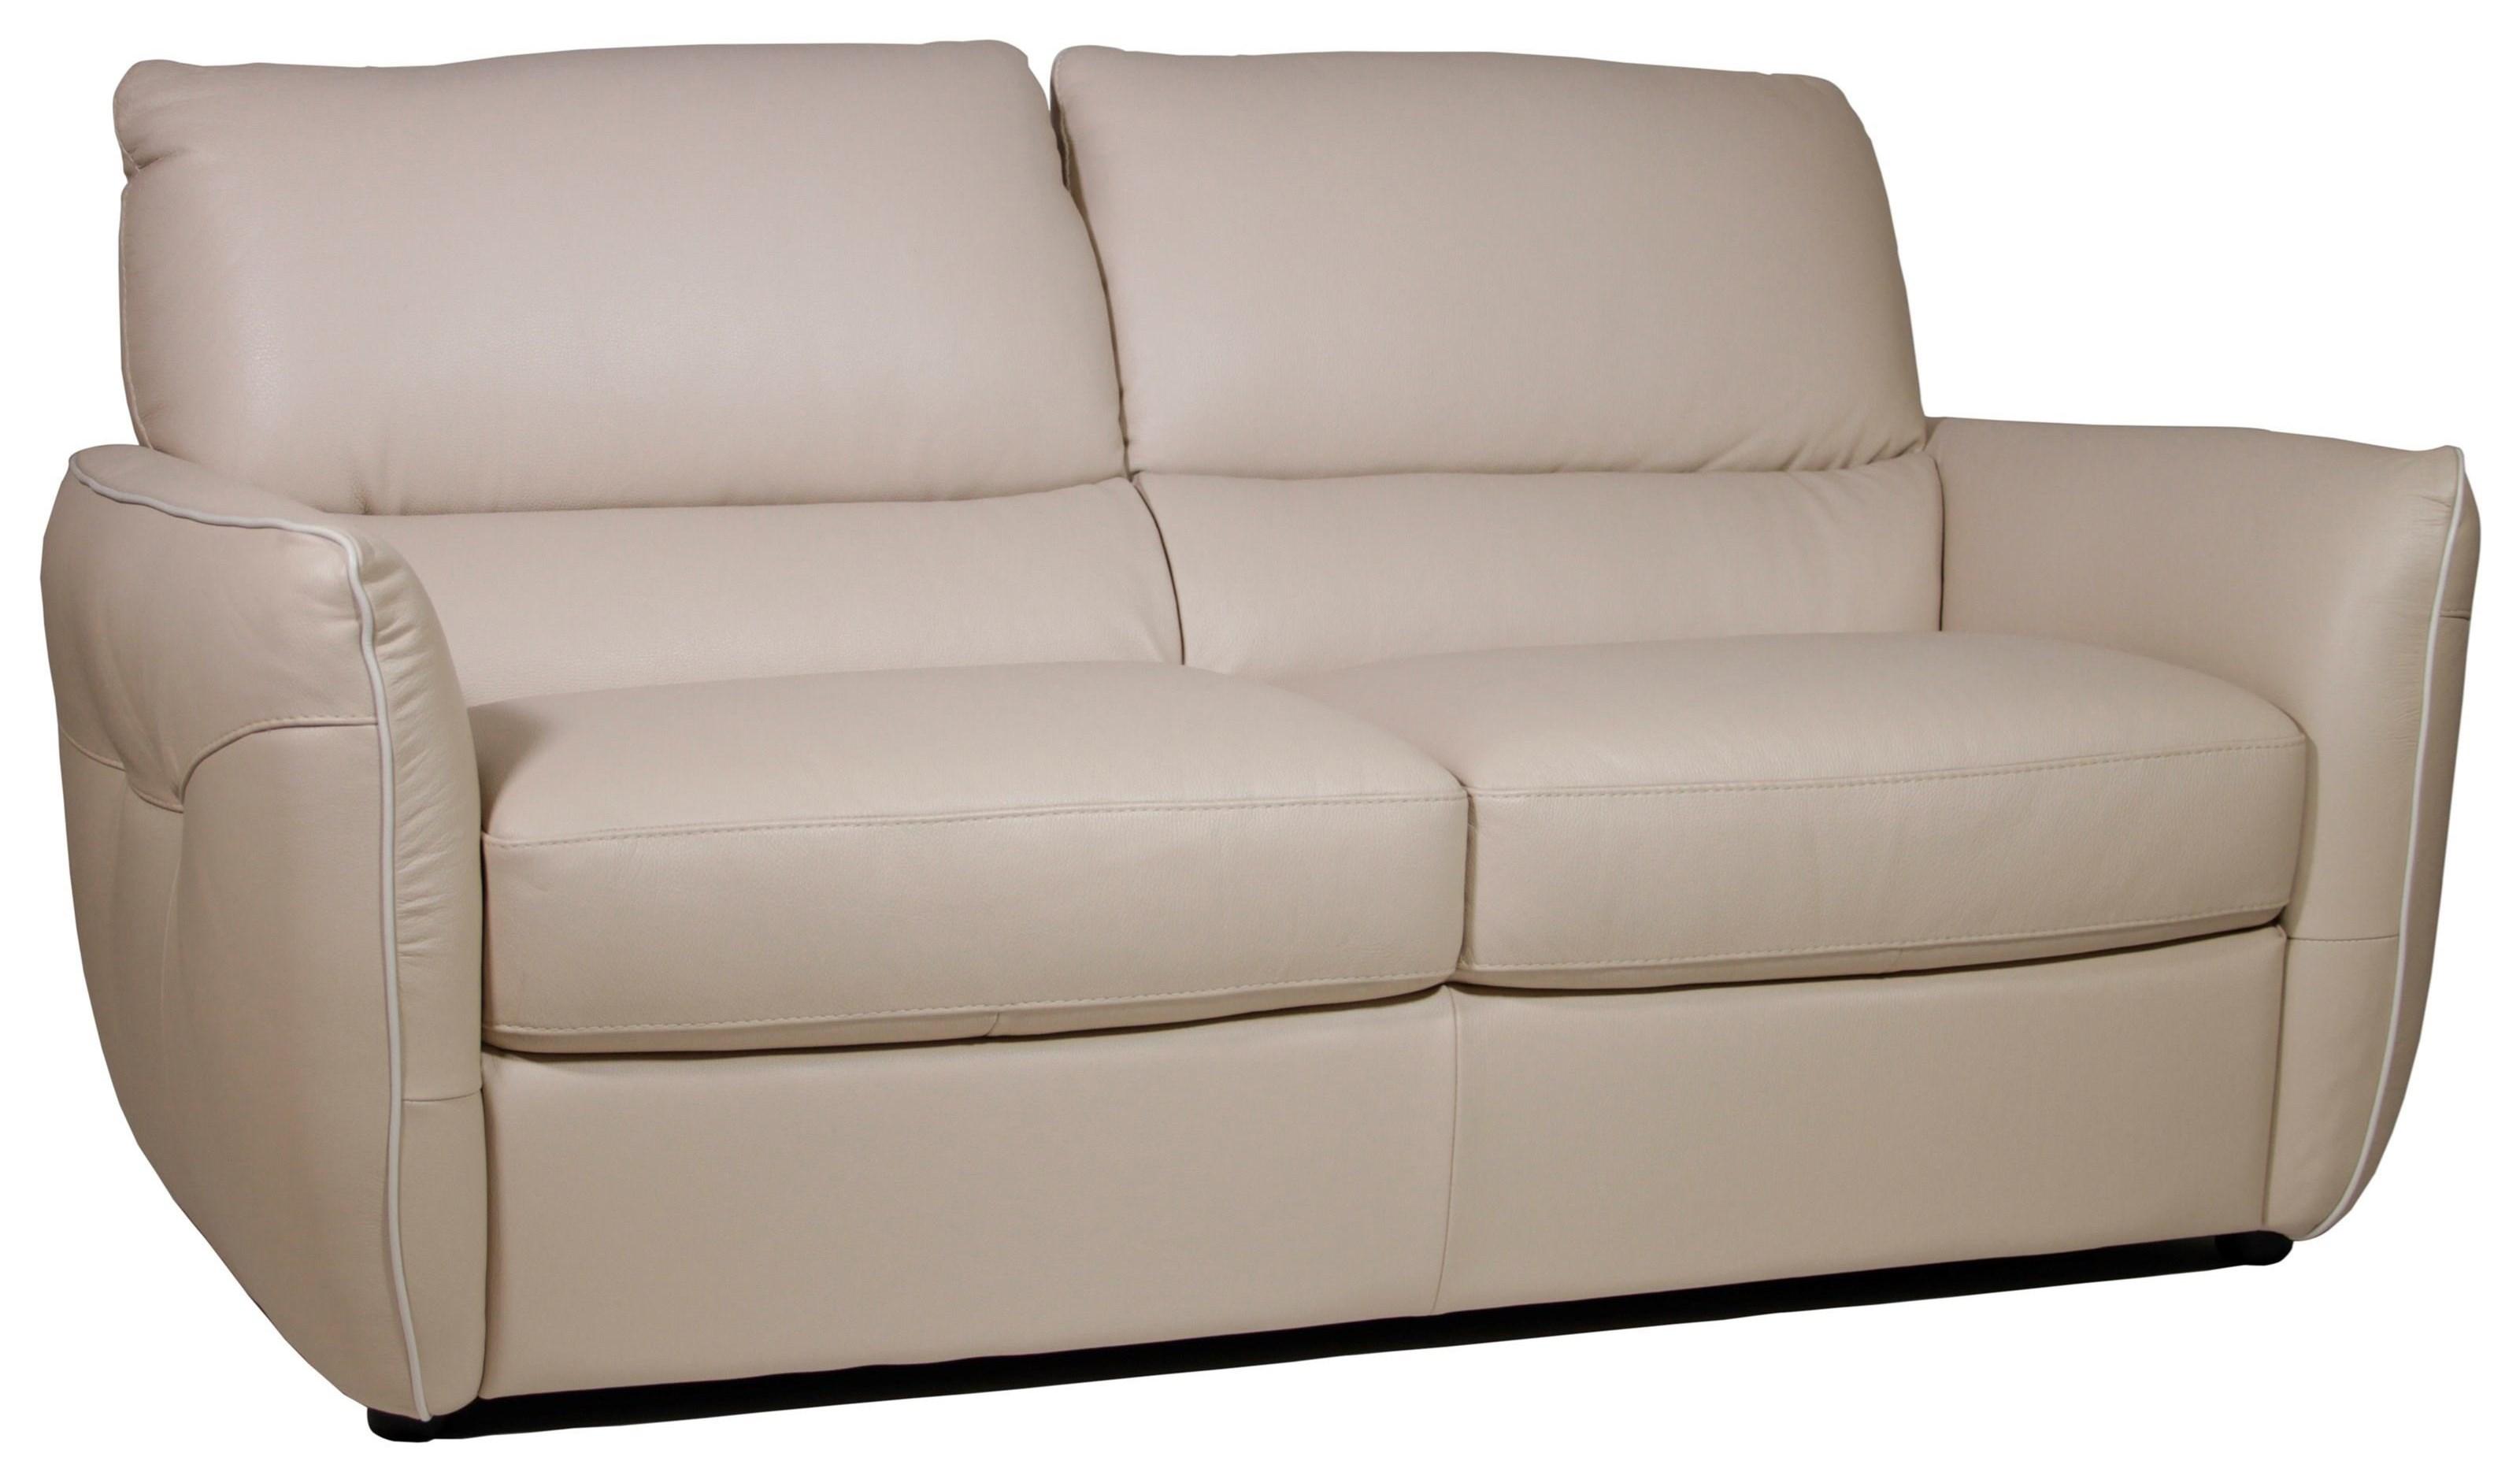 B842 Sofa Sleeper by Natuzzi Editions at Williams & Kay